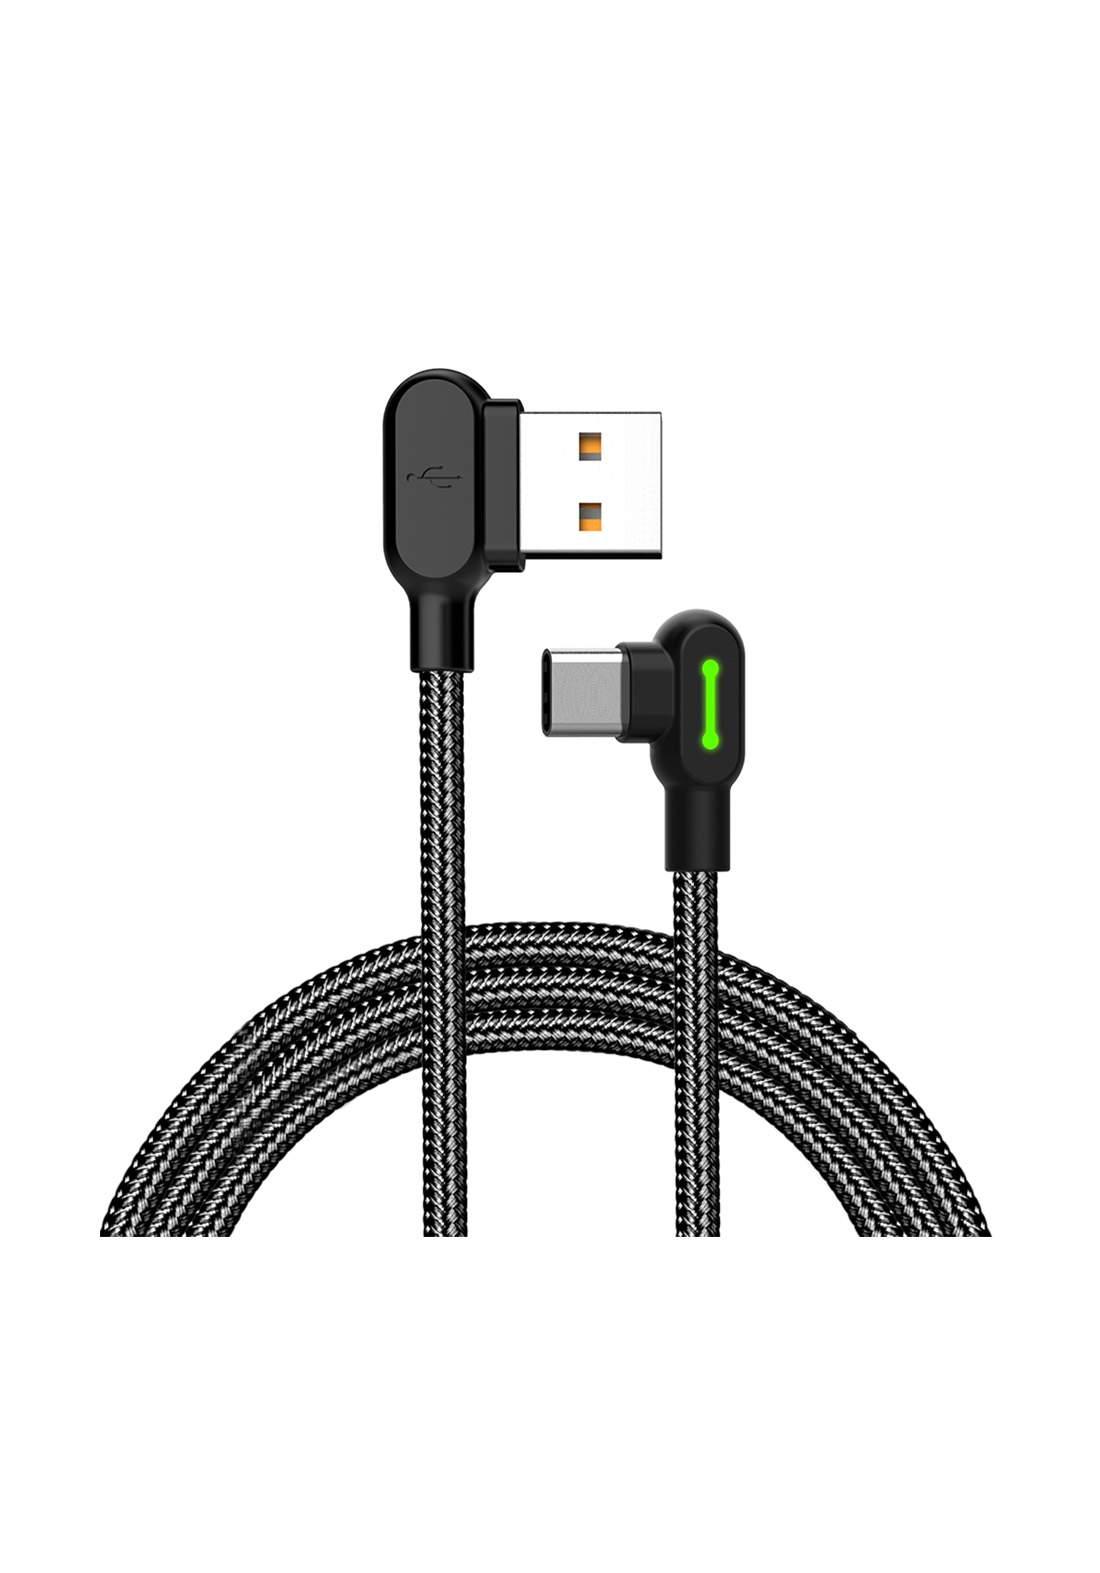 (3008)Mcdodo CA05282 USB  to USB Type-C Cable 1.8m - Black كابل